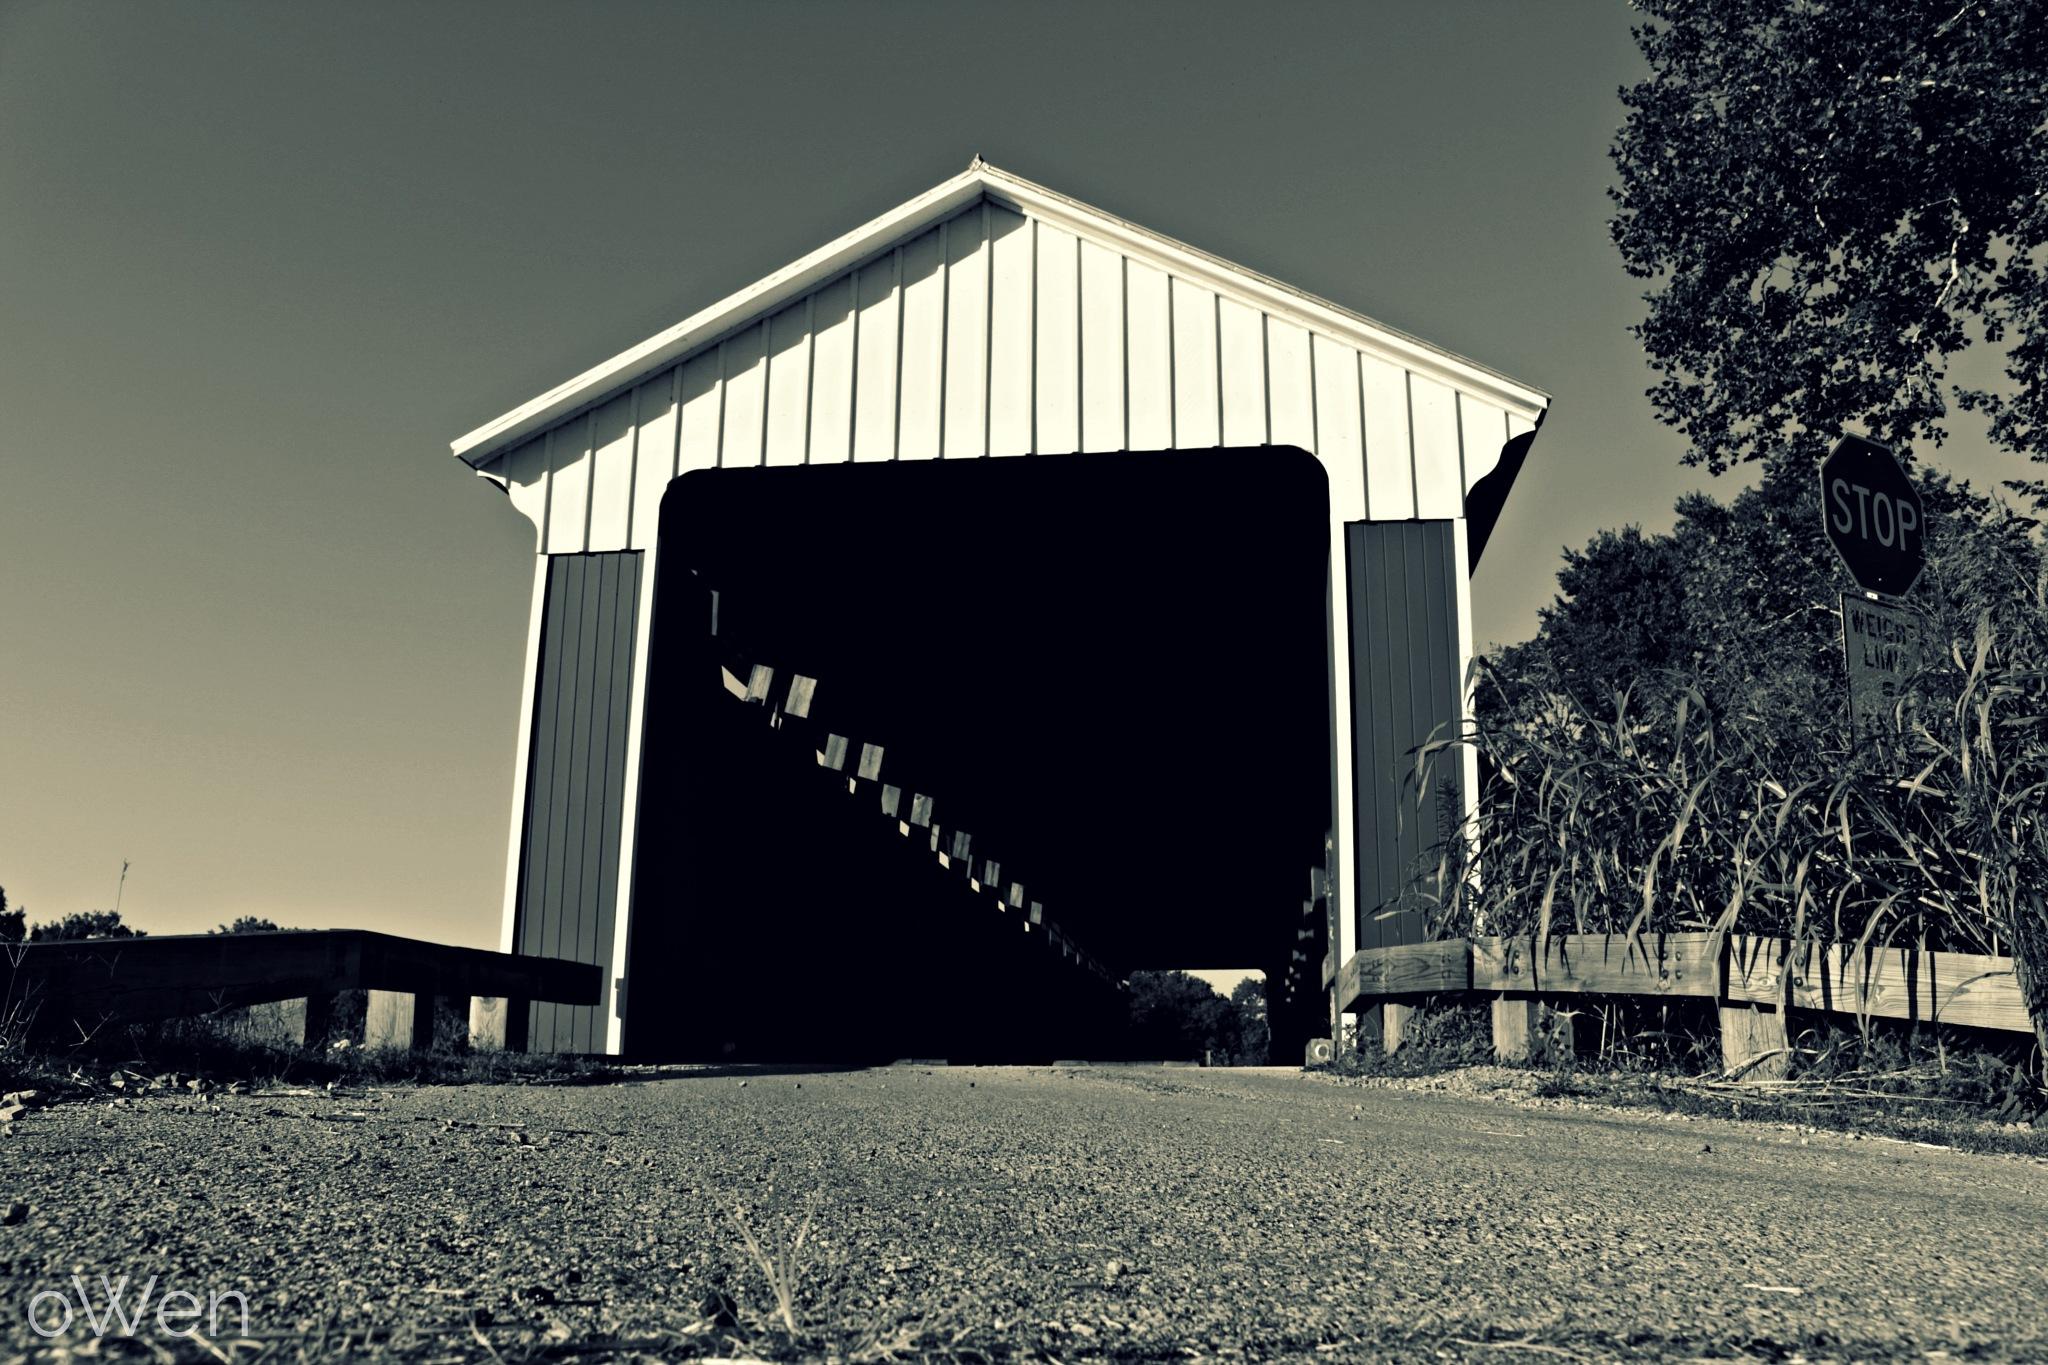 Covered Bridge by Blane Owen